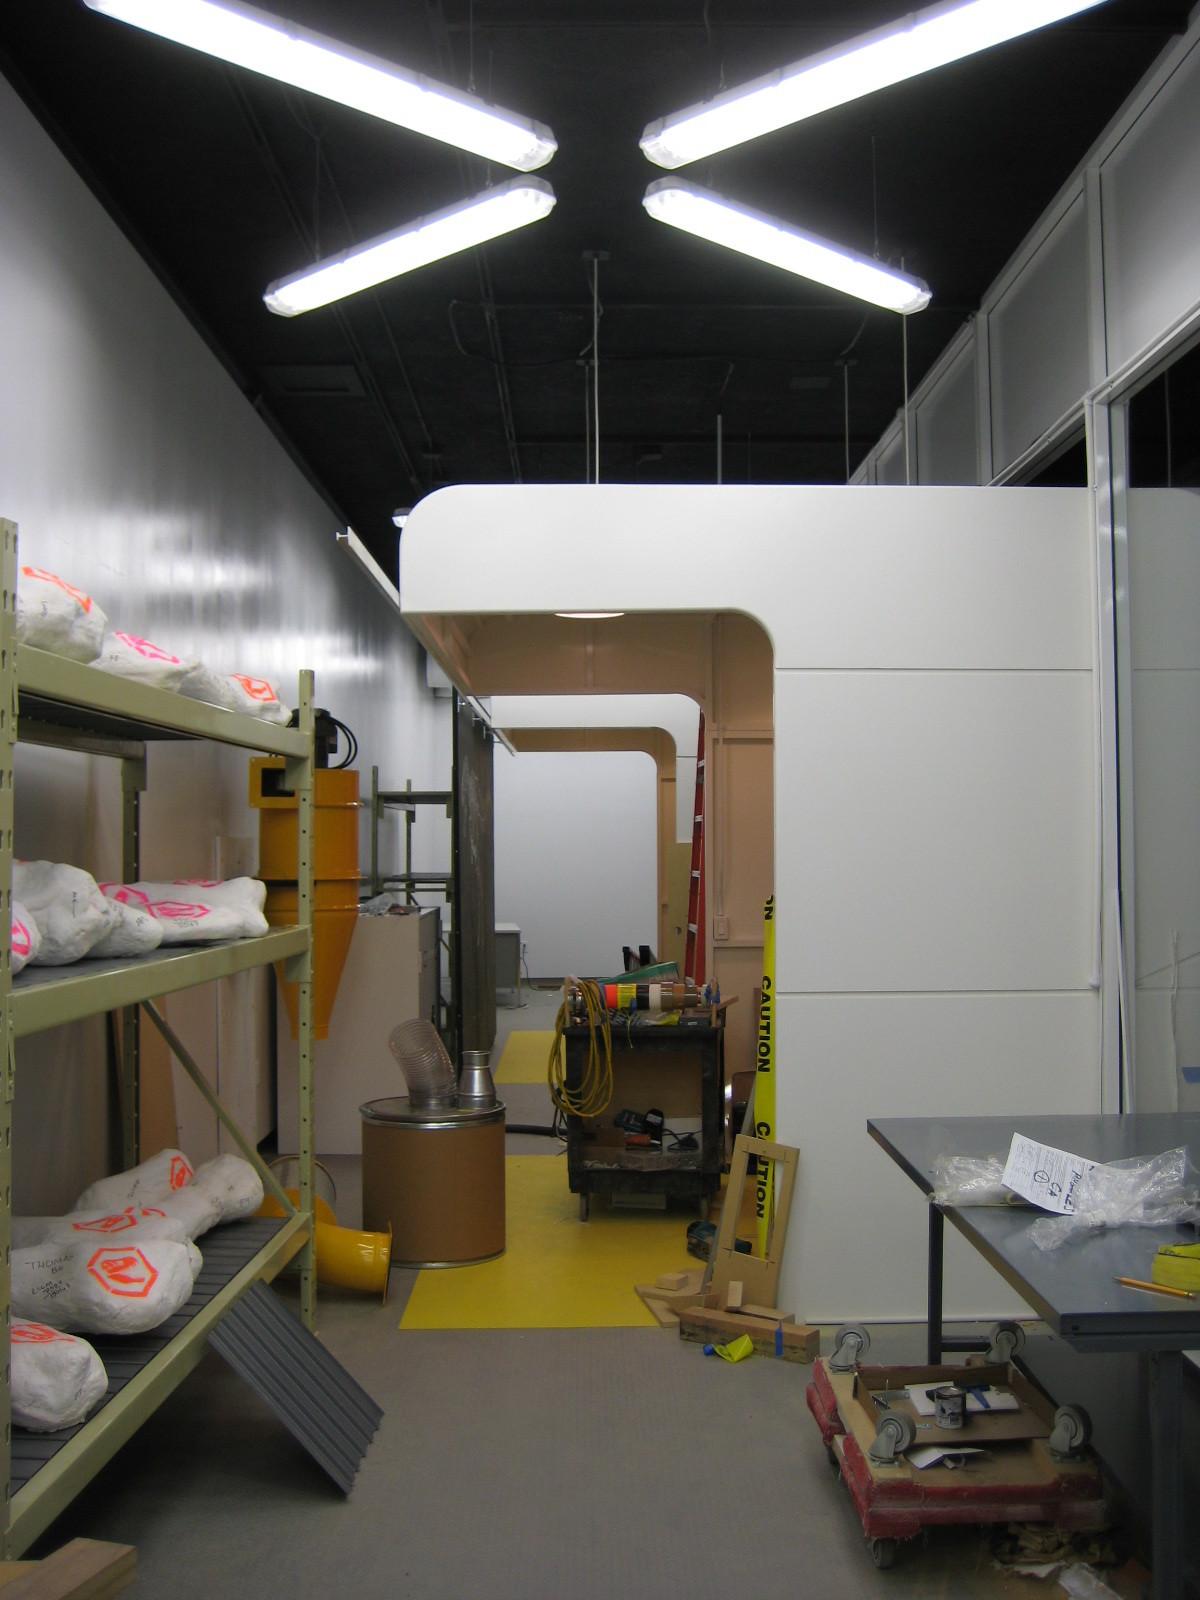 a View inside working Laboratory (work Staff)